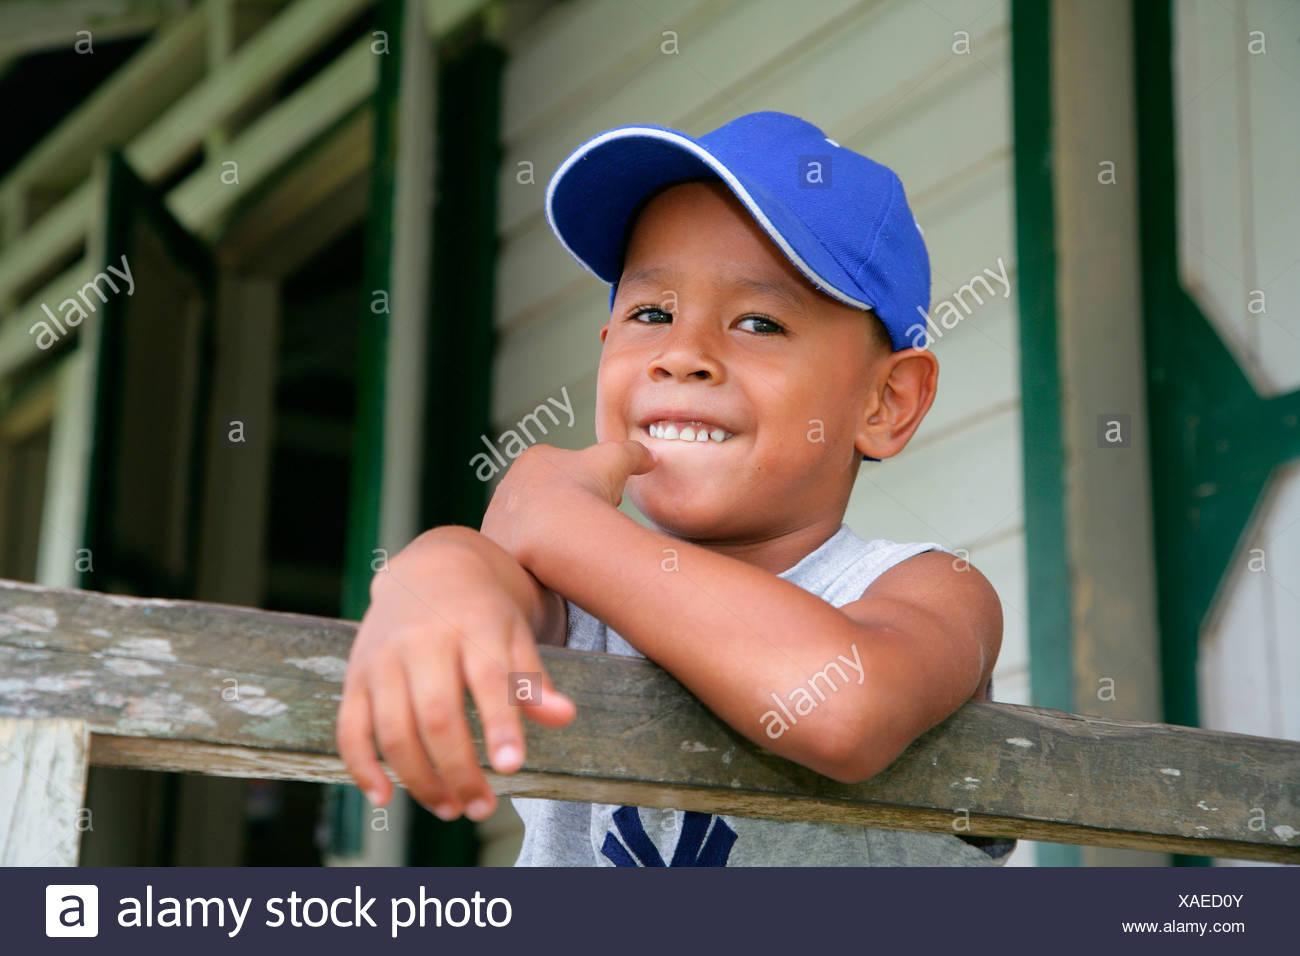 Schoolboy during recess, Arawak natives, Santa Mission, Guyana, South America - Stock Image